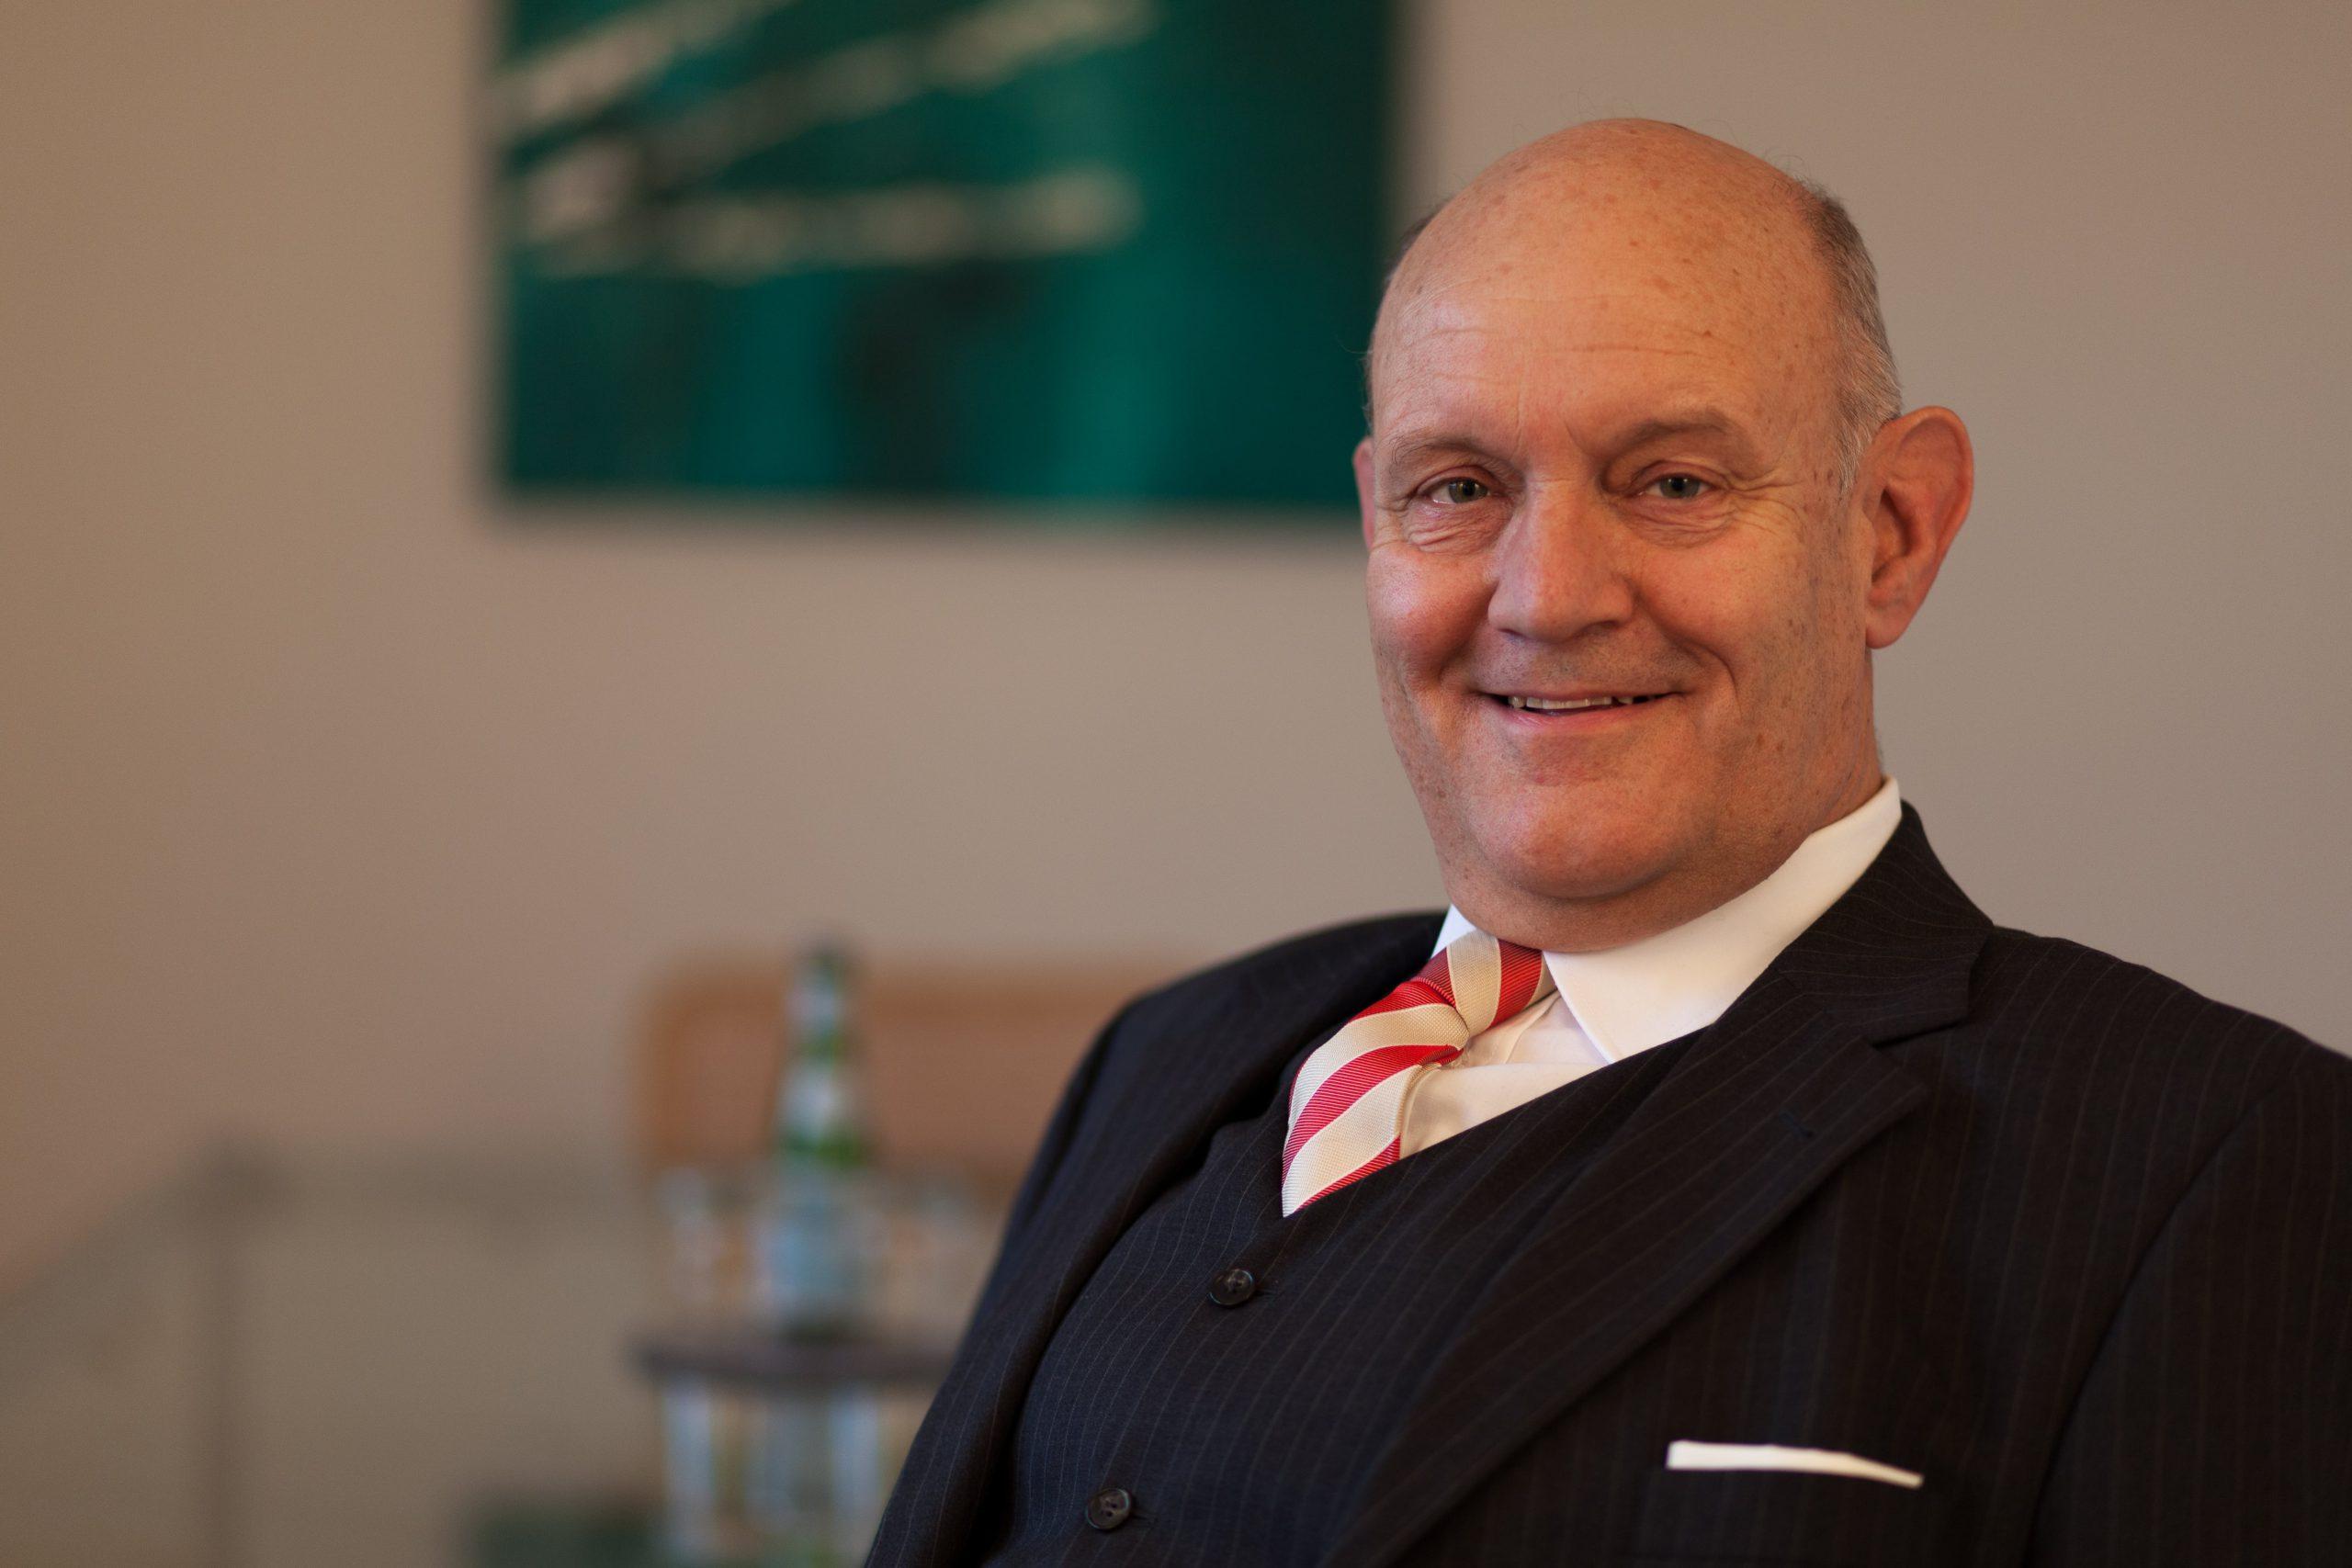 Rechtsanwalt Klaus Fella